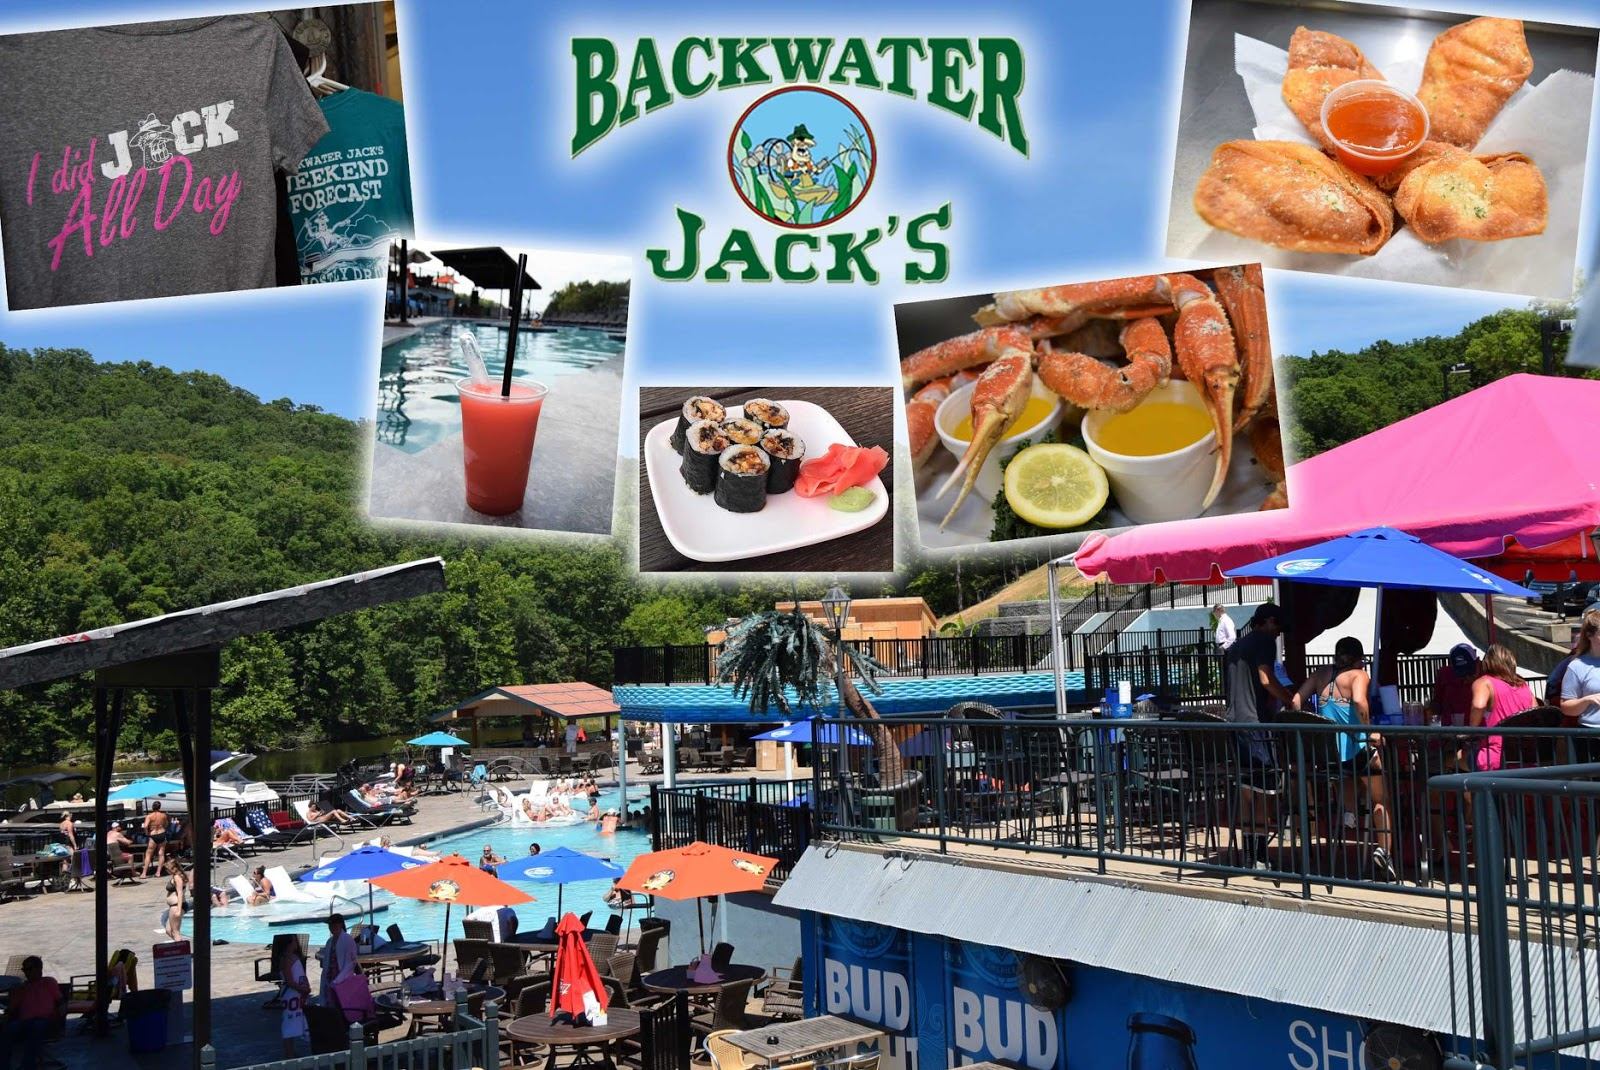 7 Reasons Youve Still Gotta Get Back To Backwater Jacks